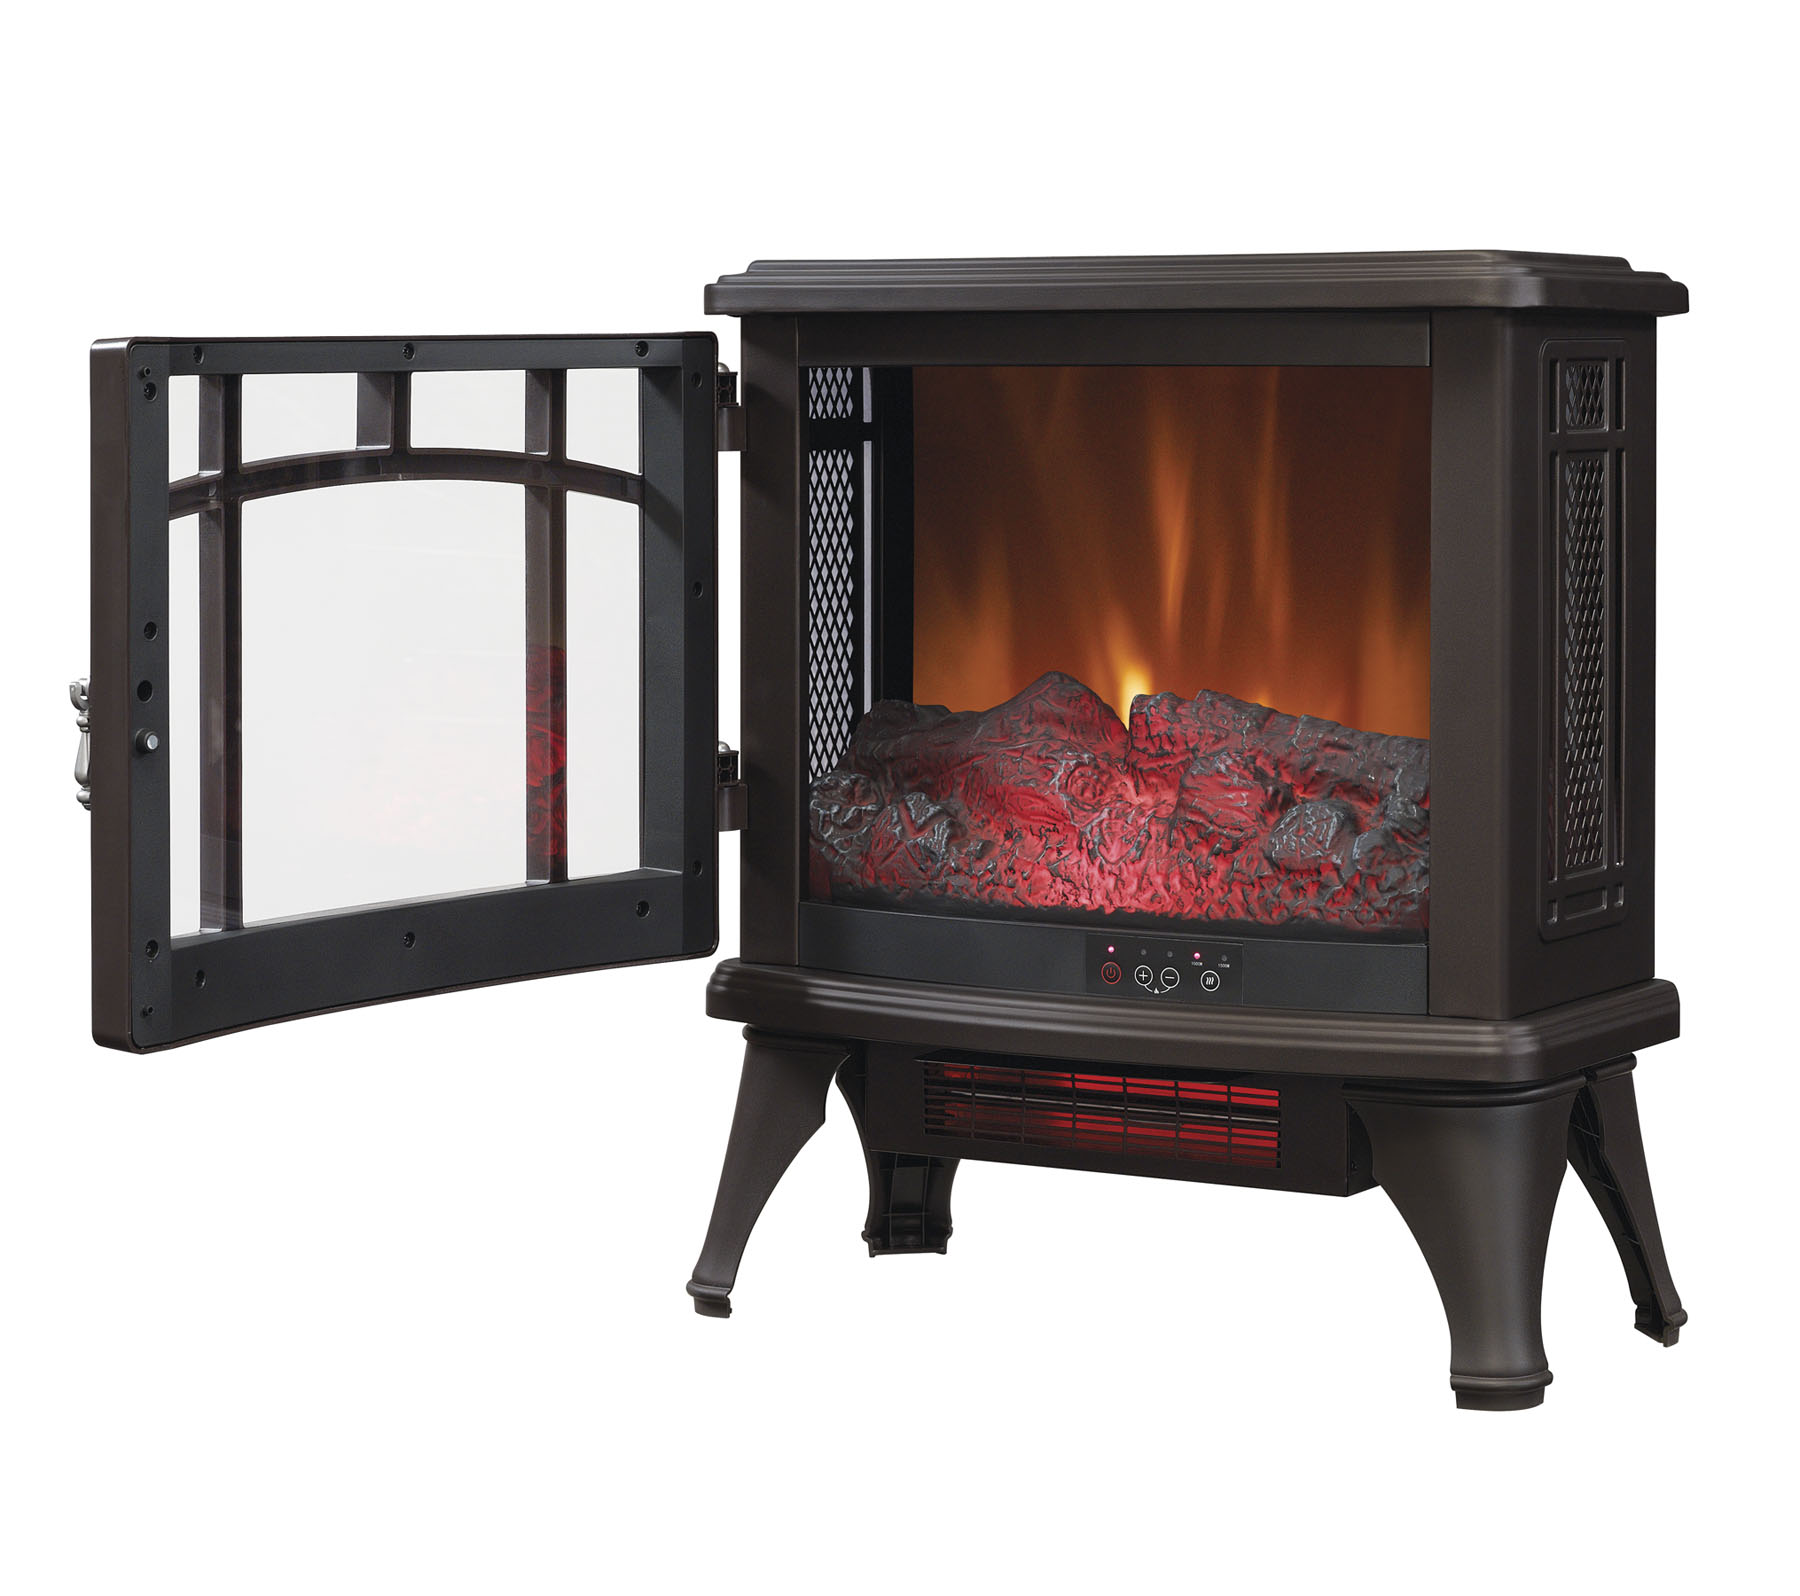 Cool Duraflame Infrared Quartz Fireplace Stove Bronze Interior Design Ideas Gentotryabchikinfo